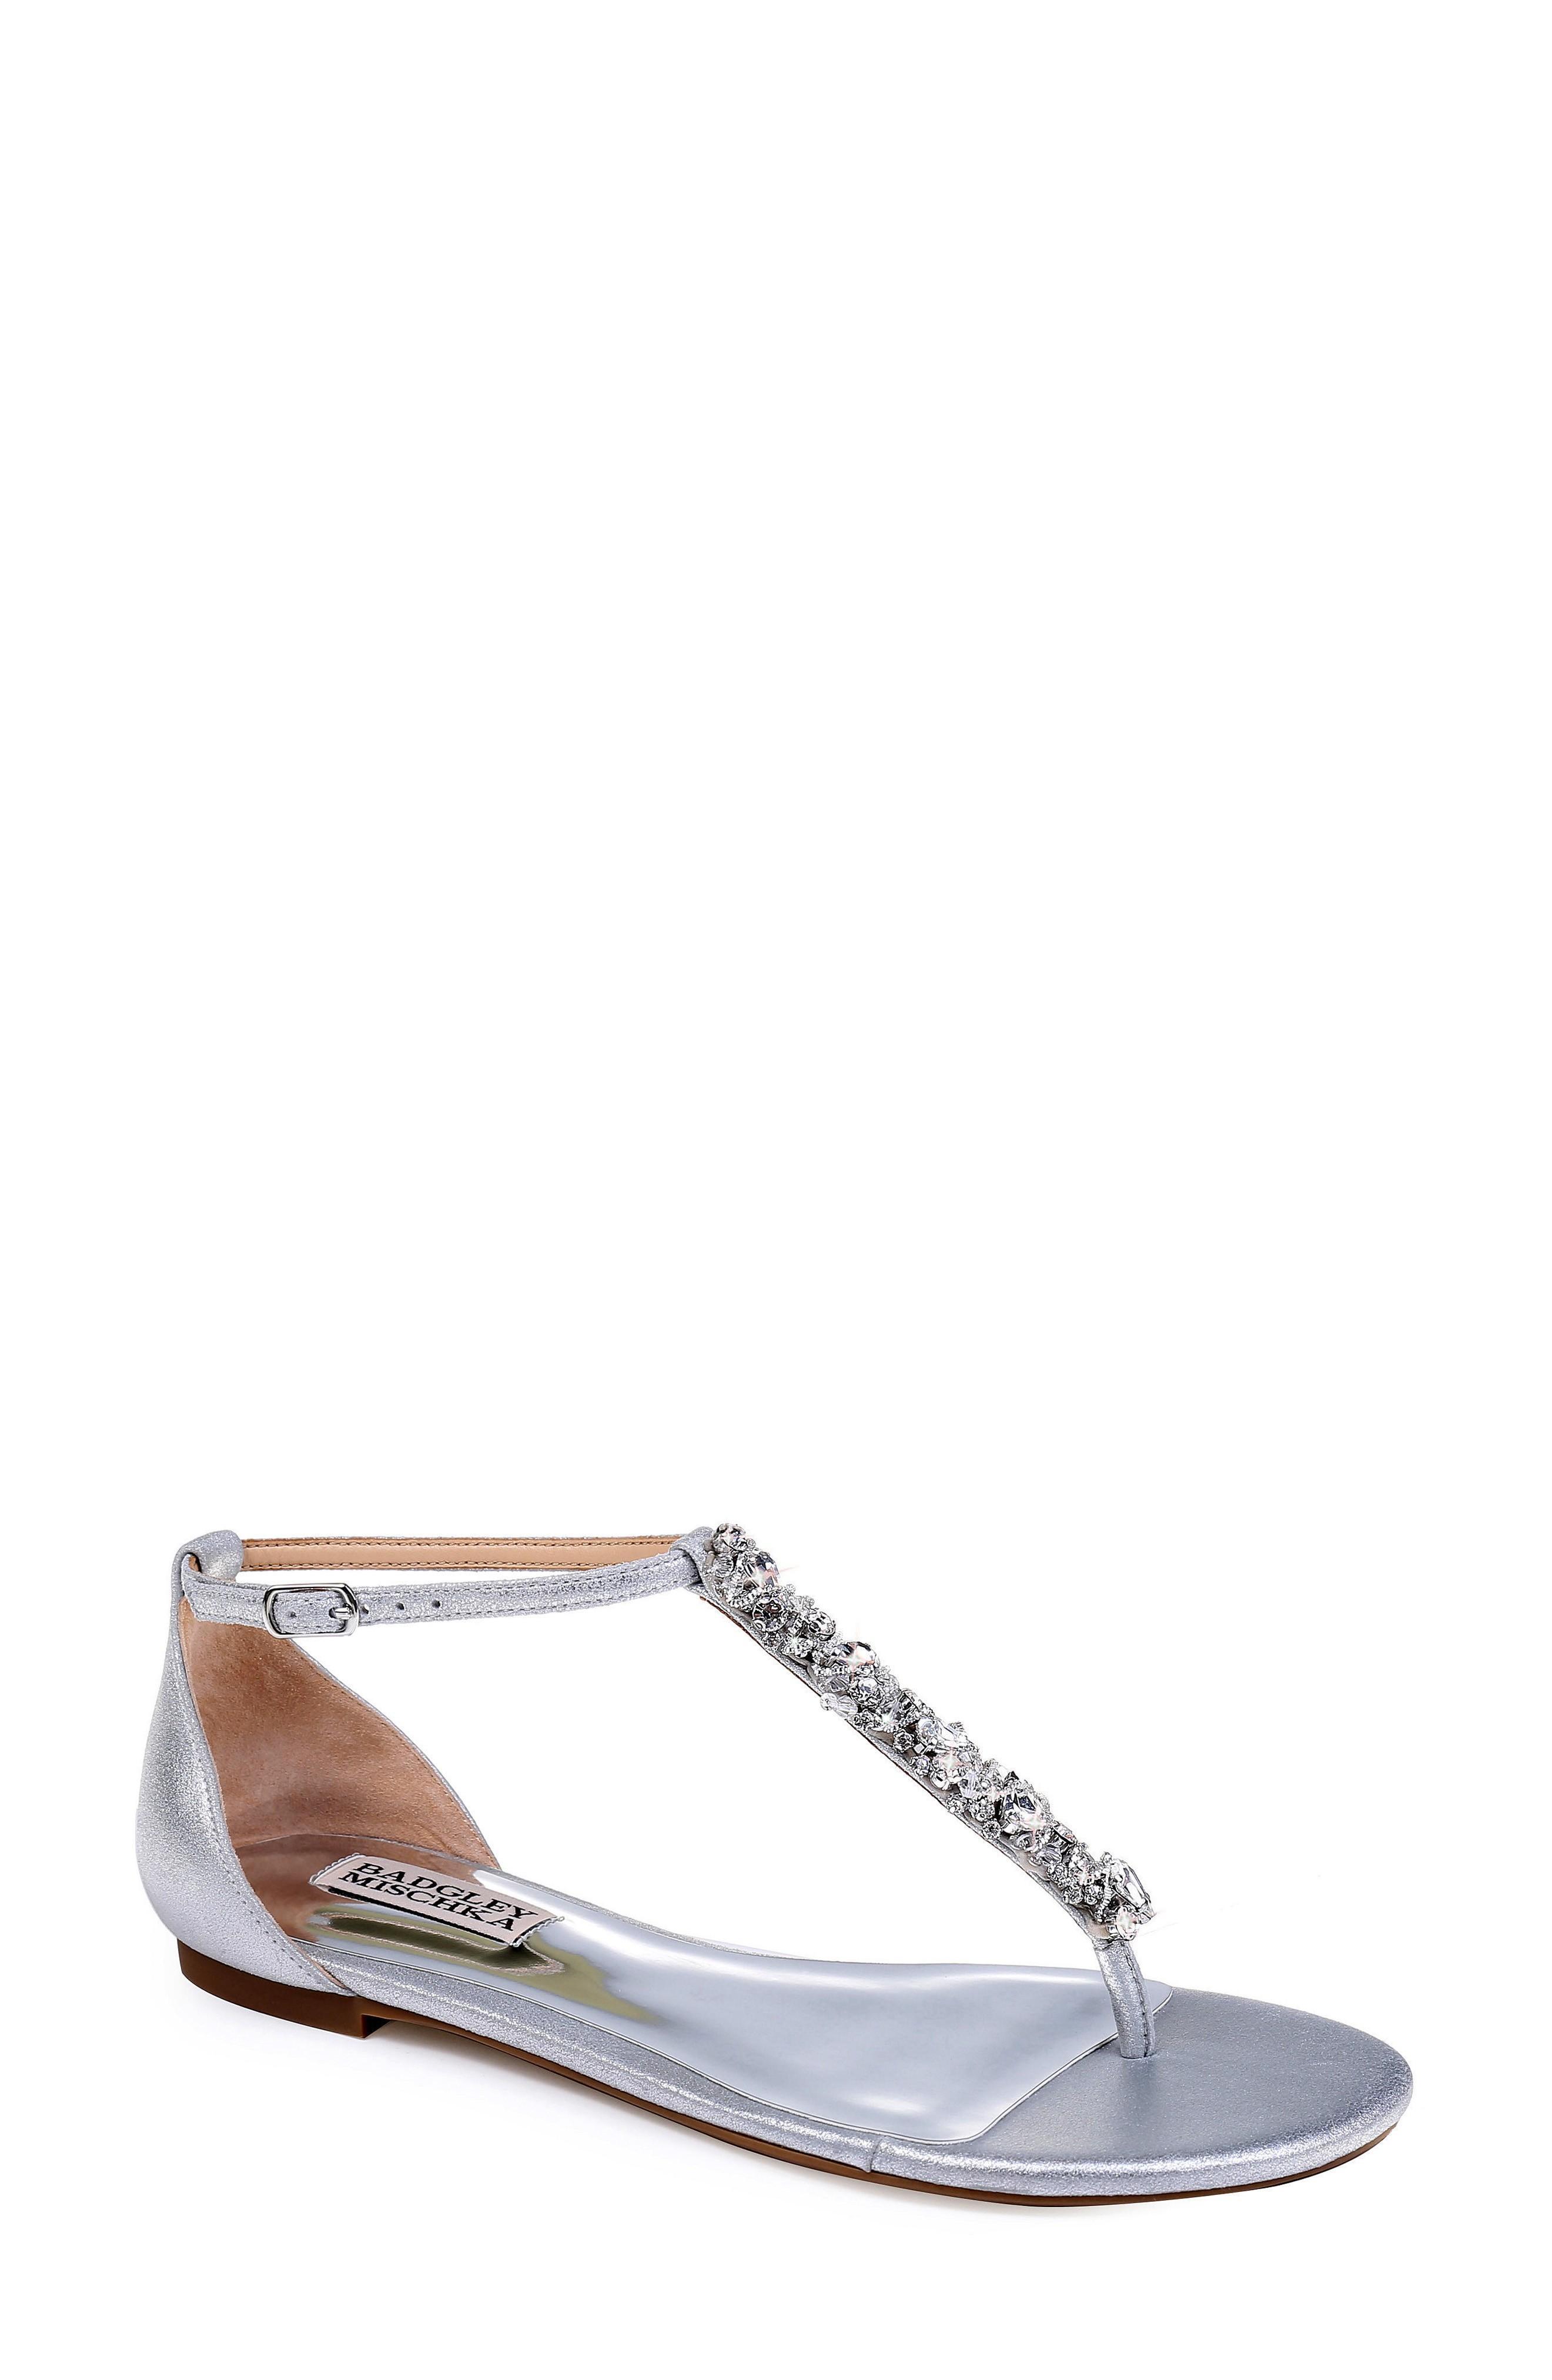 Badgley Mischka Holbrook T-Strap Sandal In Silver Metallic Suede